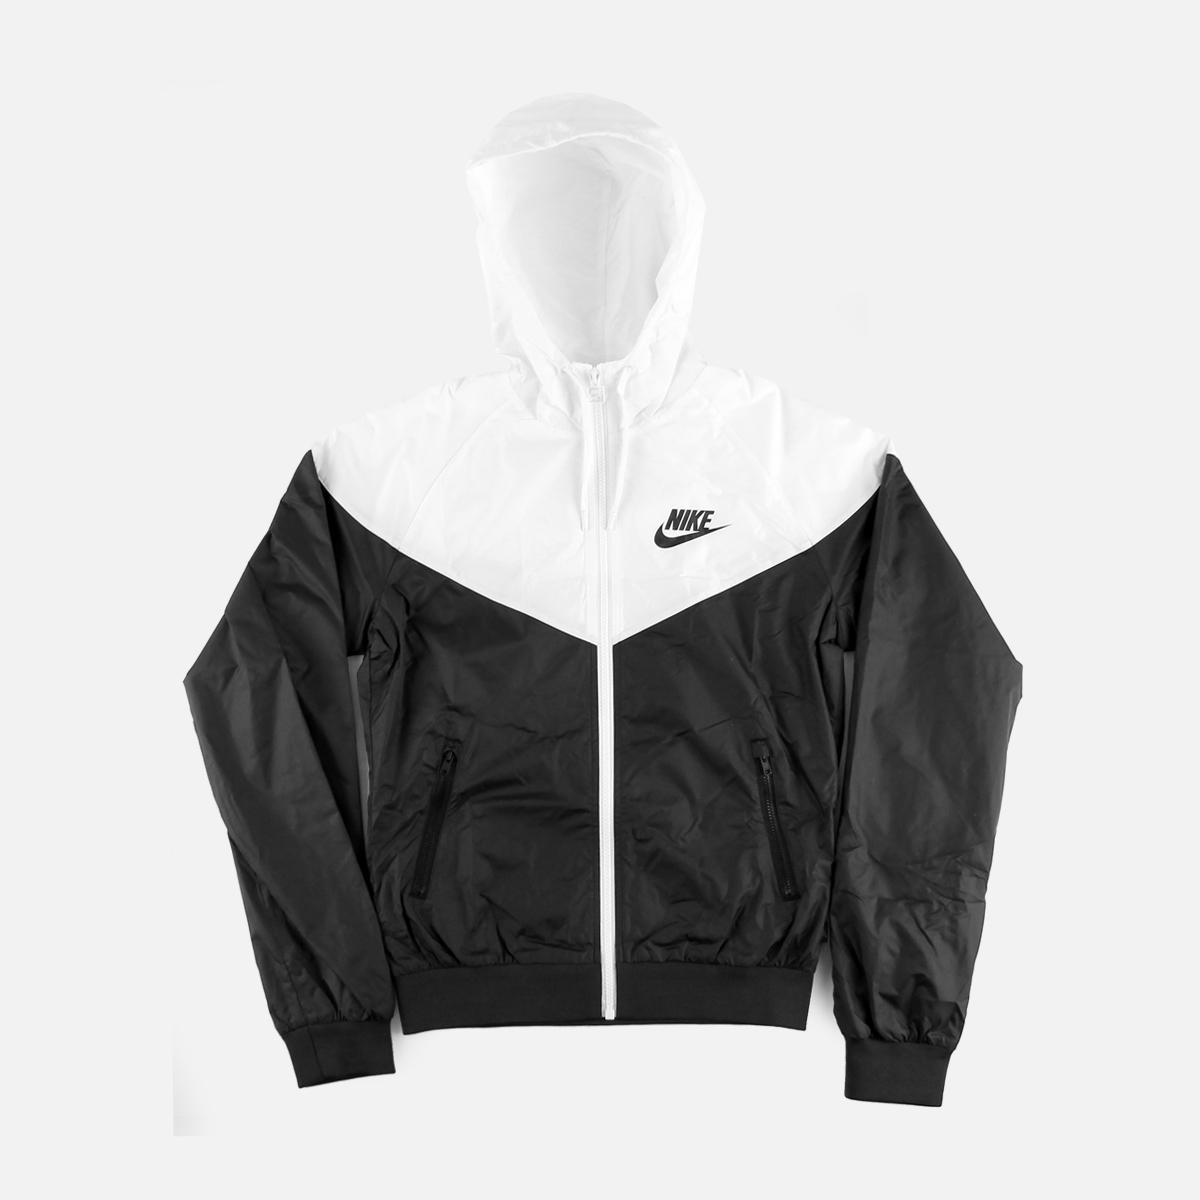 Nike White And Black Windbreaker April 2017